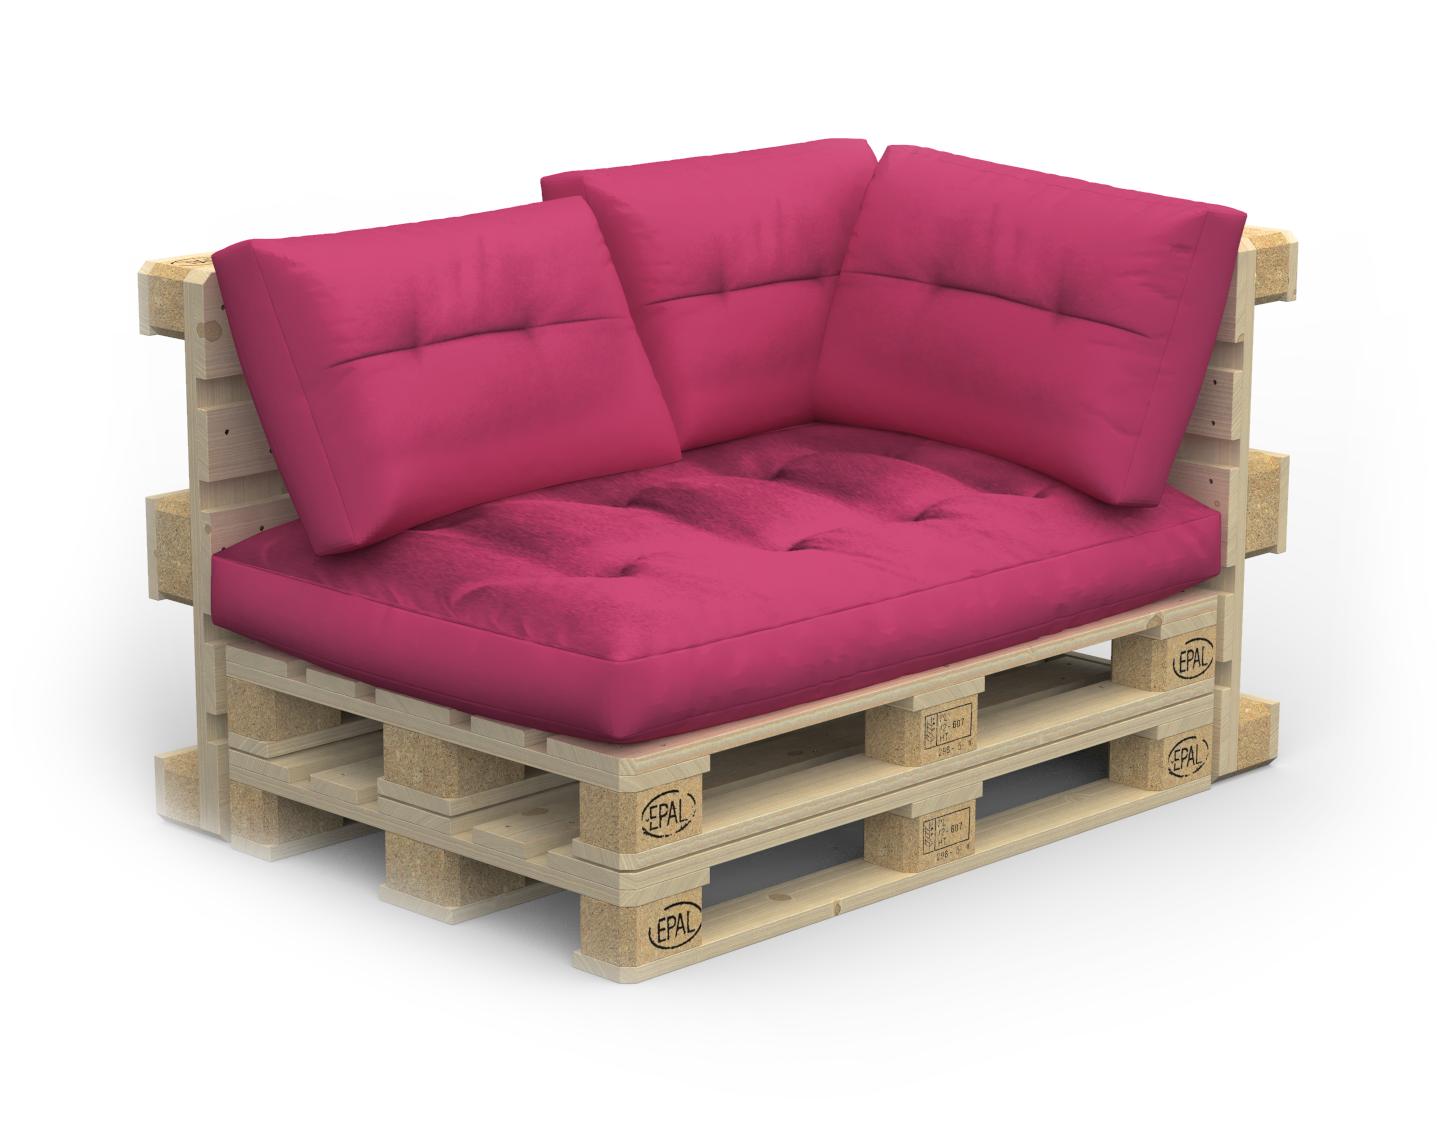 Palettenlounge RIVERA inkl. Kissen pink